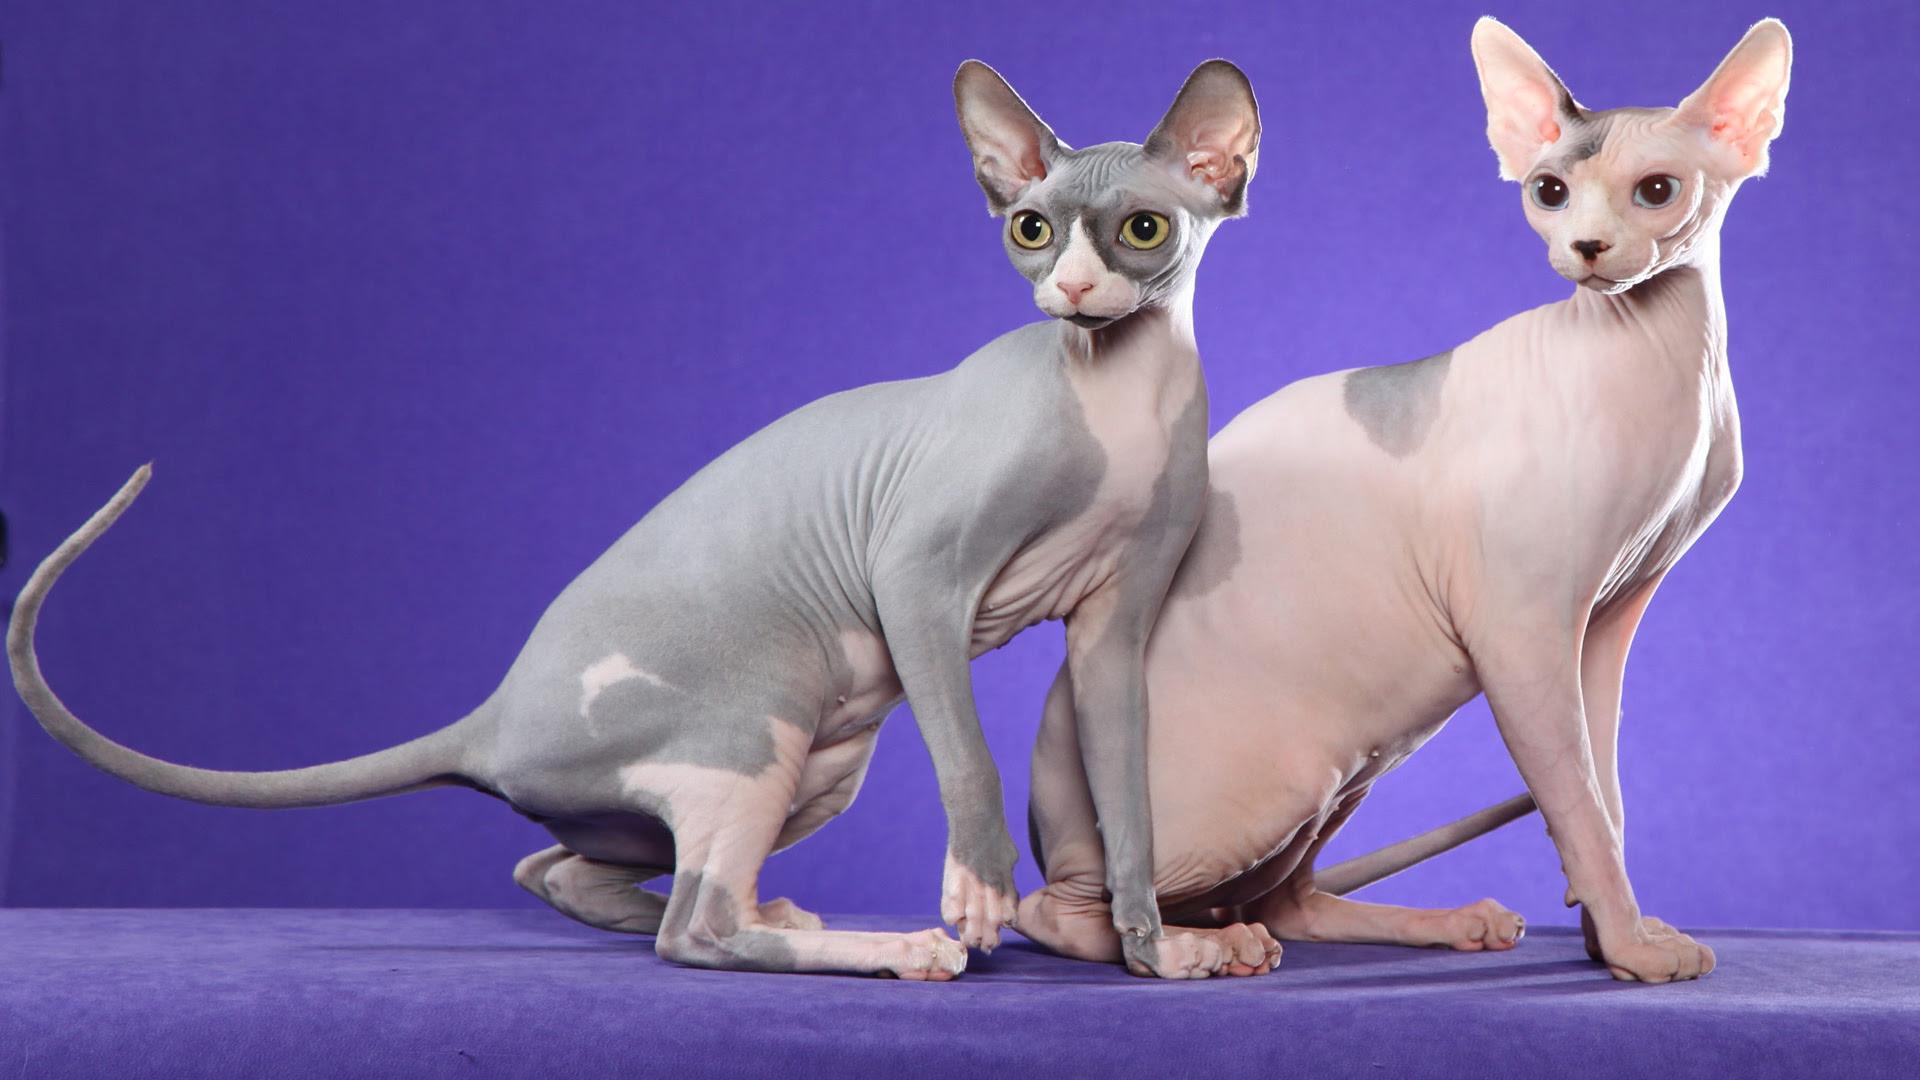 Animals Cats Sphynx cats on a purple [1920x1080]